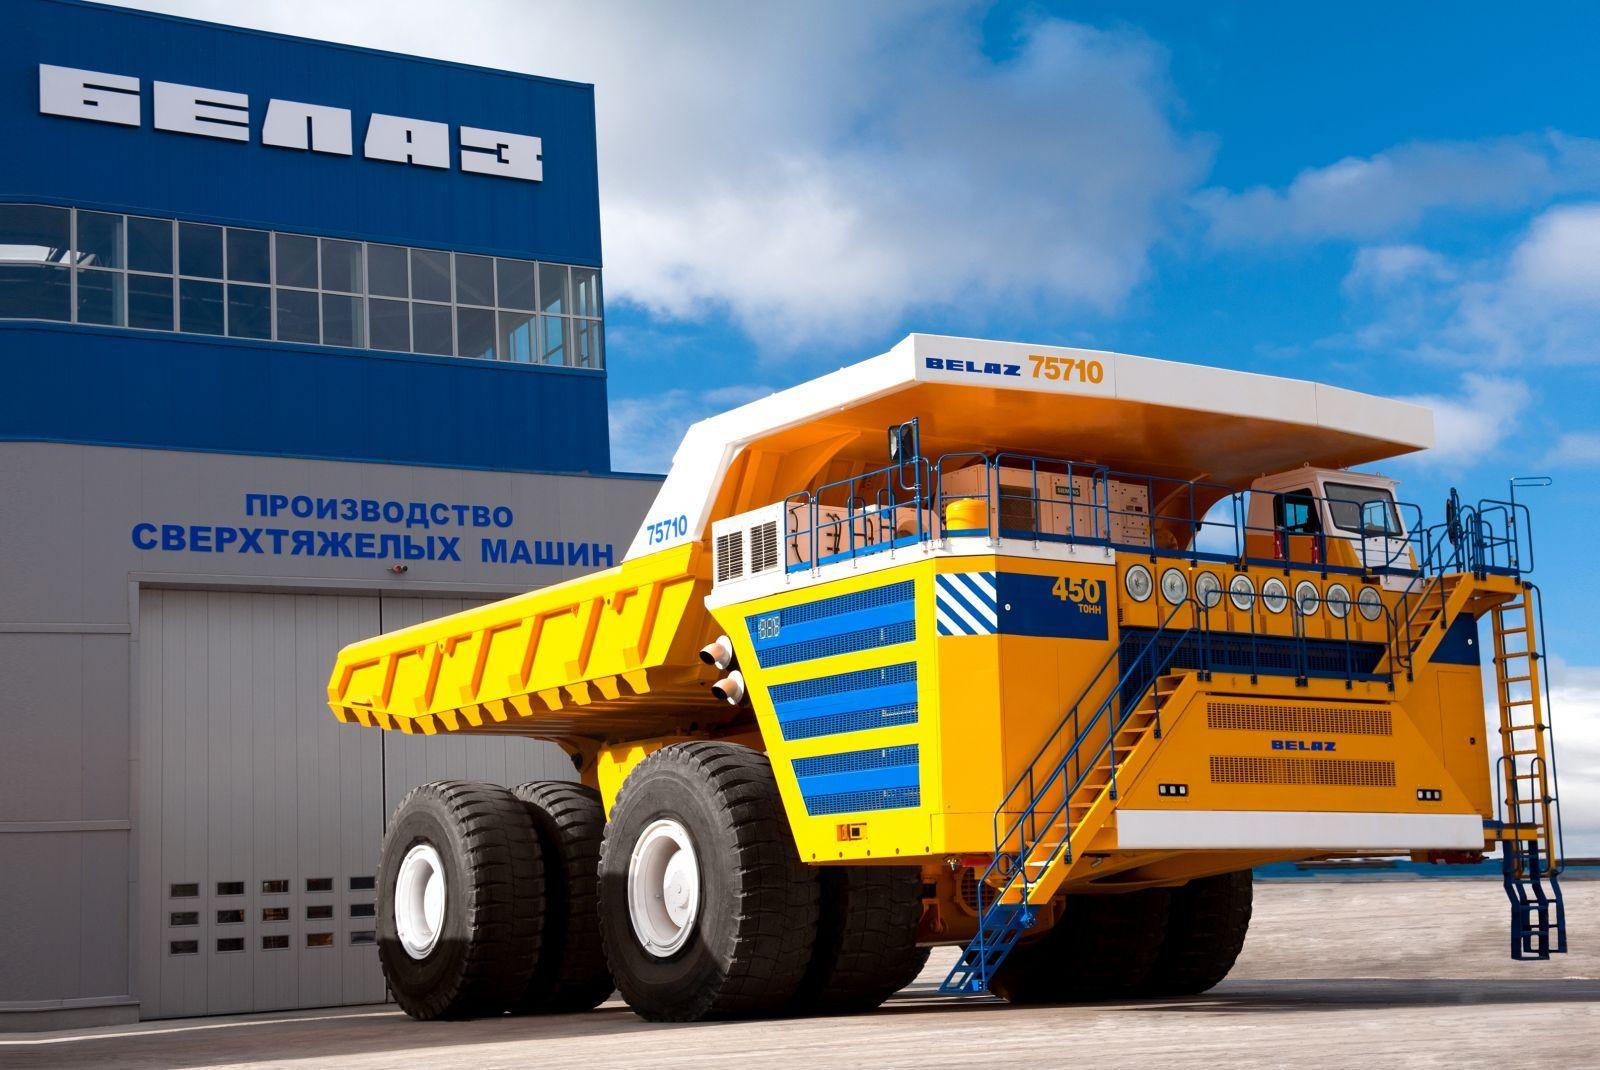 World's Largest Dump Truck >> The World S Largest Dump Truck Belaz 75710 Belaz Australia